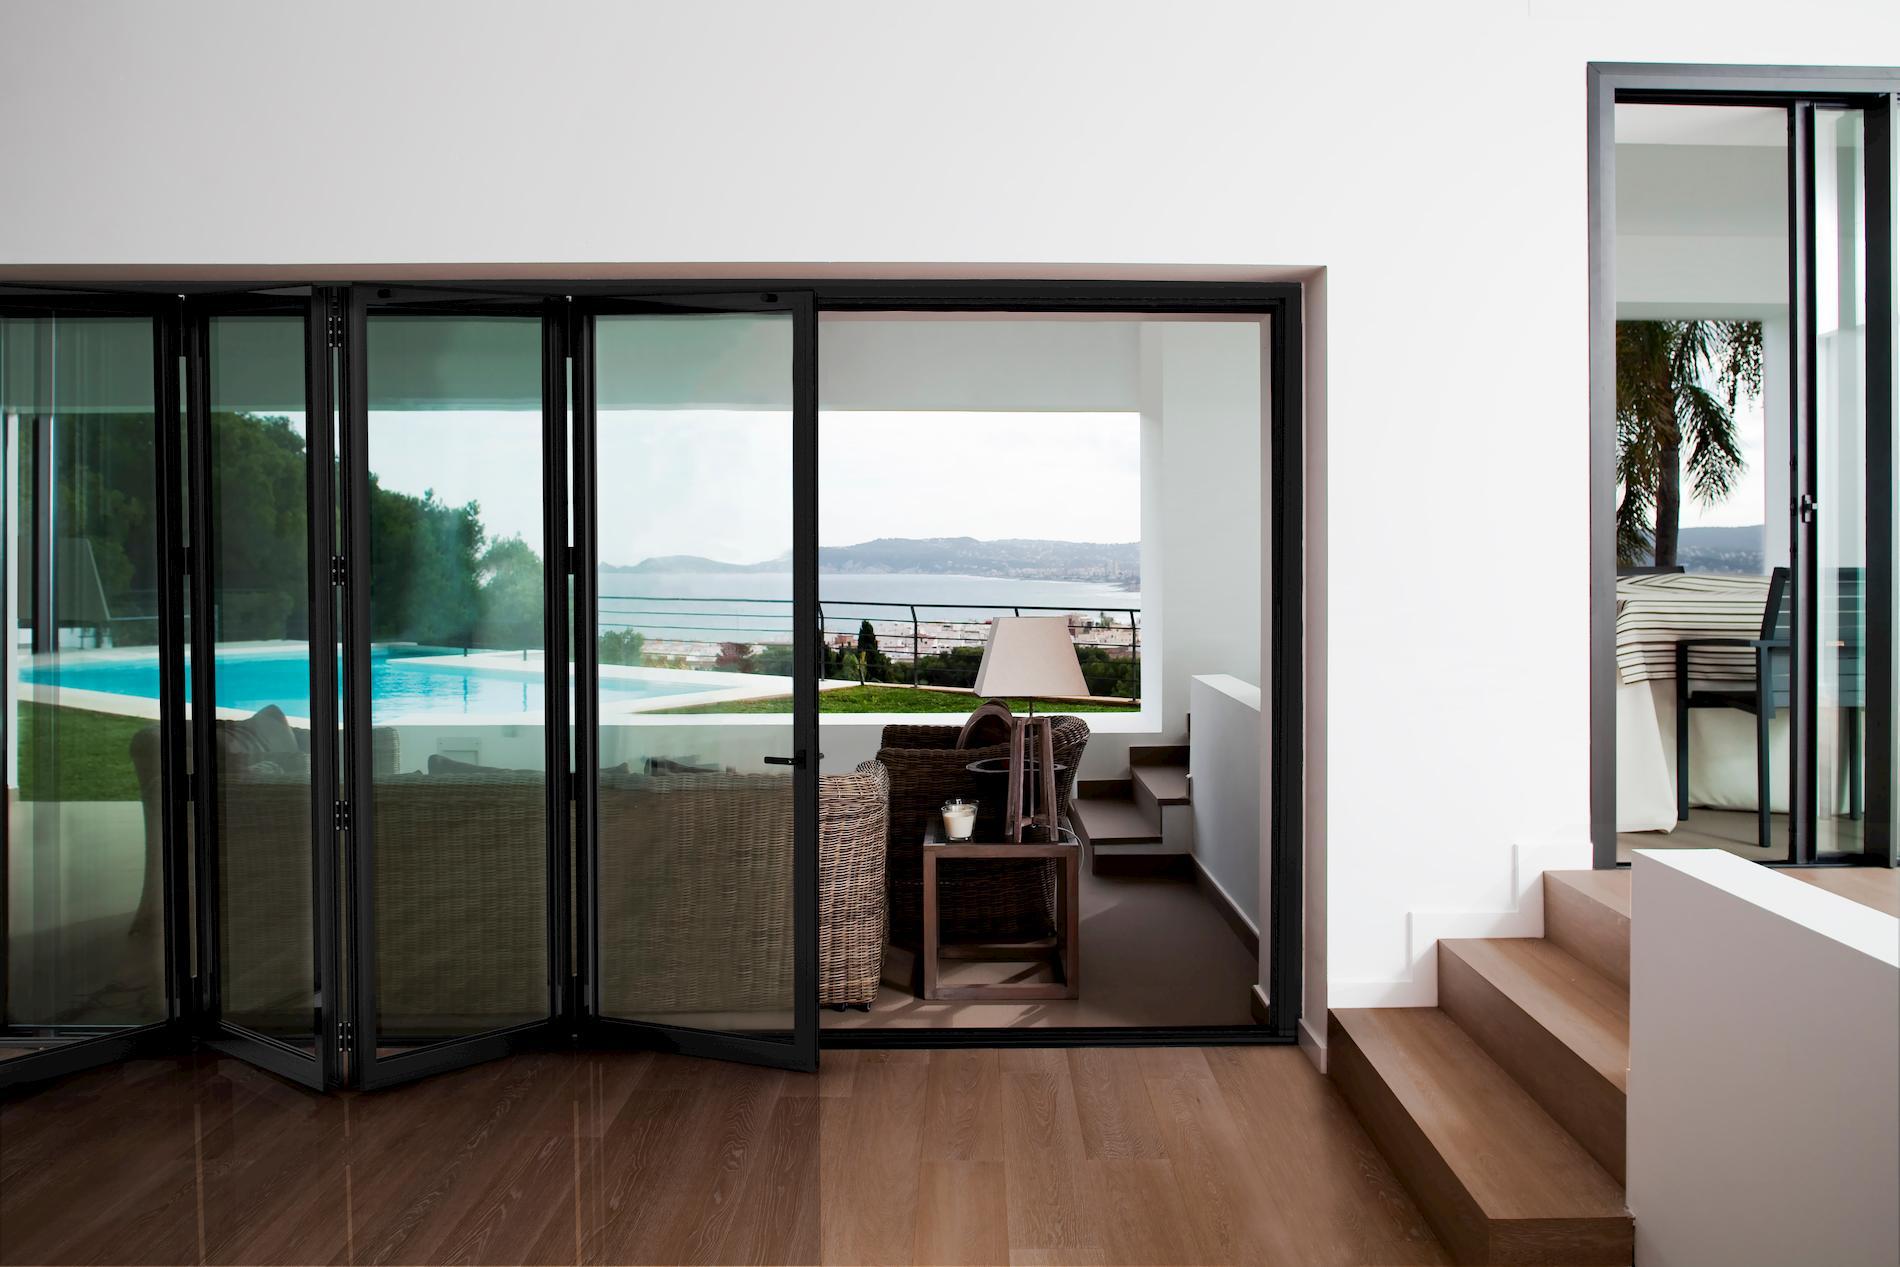 Unifold Doors for home improvement